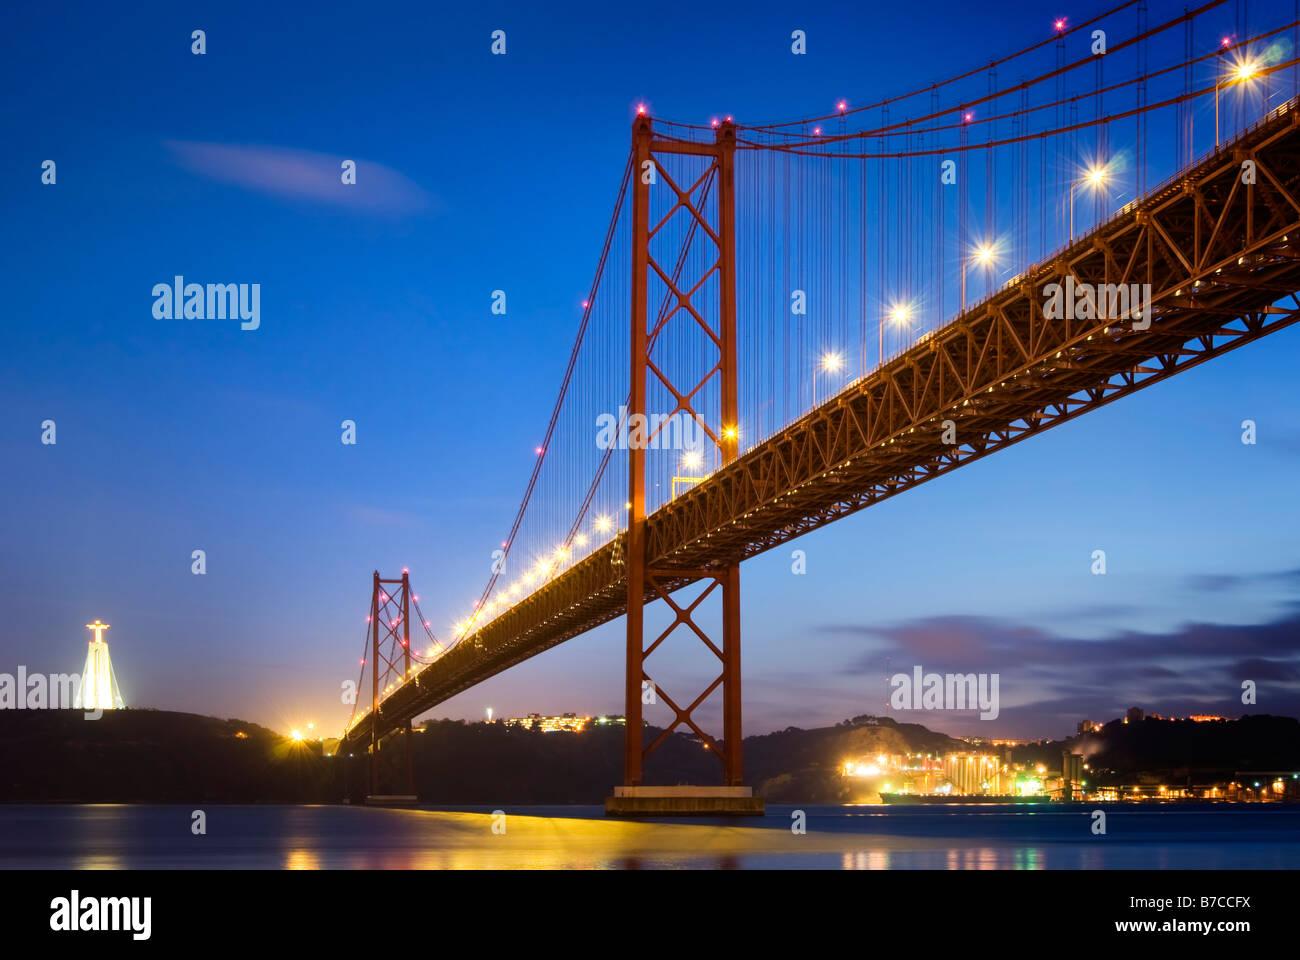 Ponte 25 de Abril in Lisbon at dusk - Stock Image